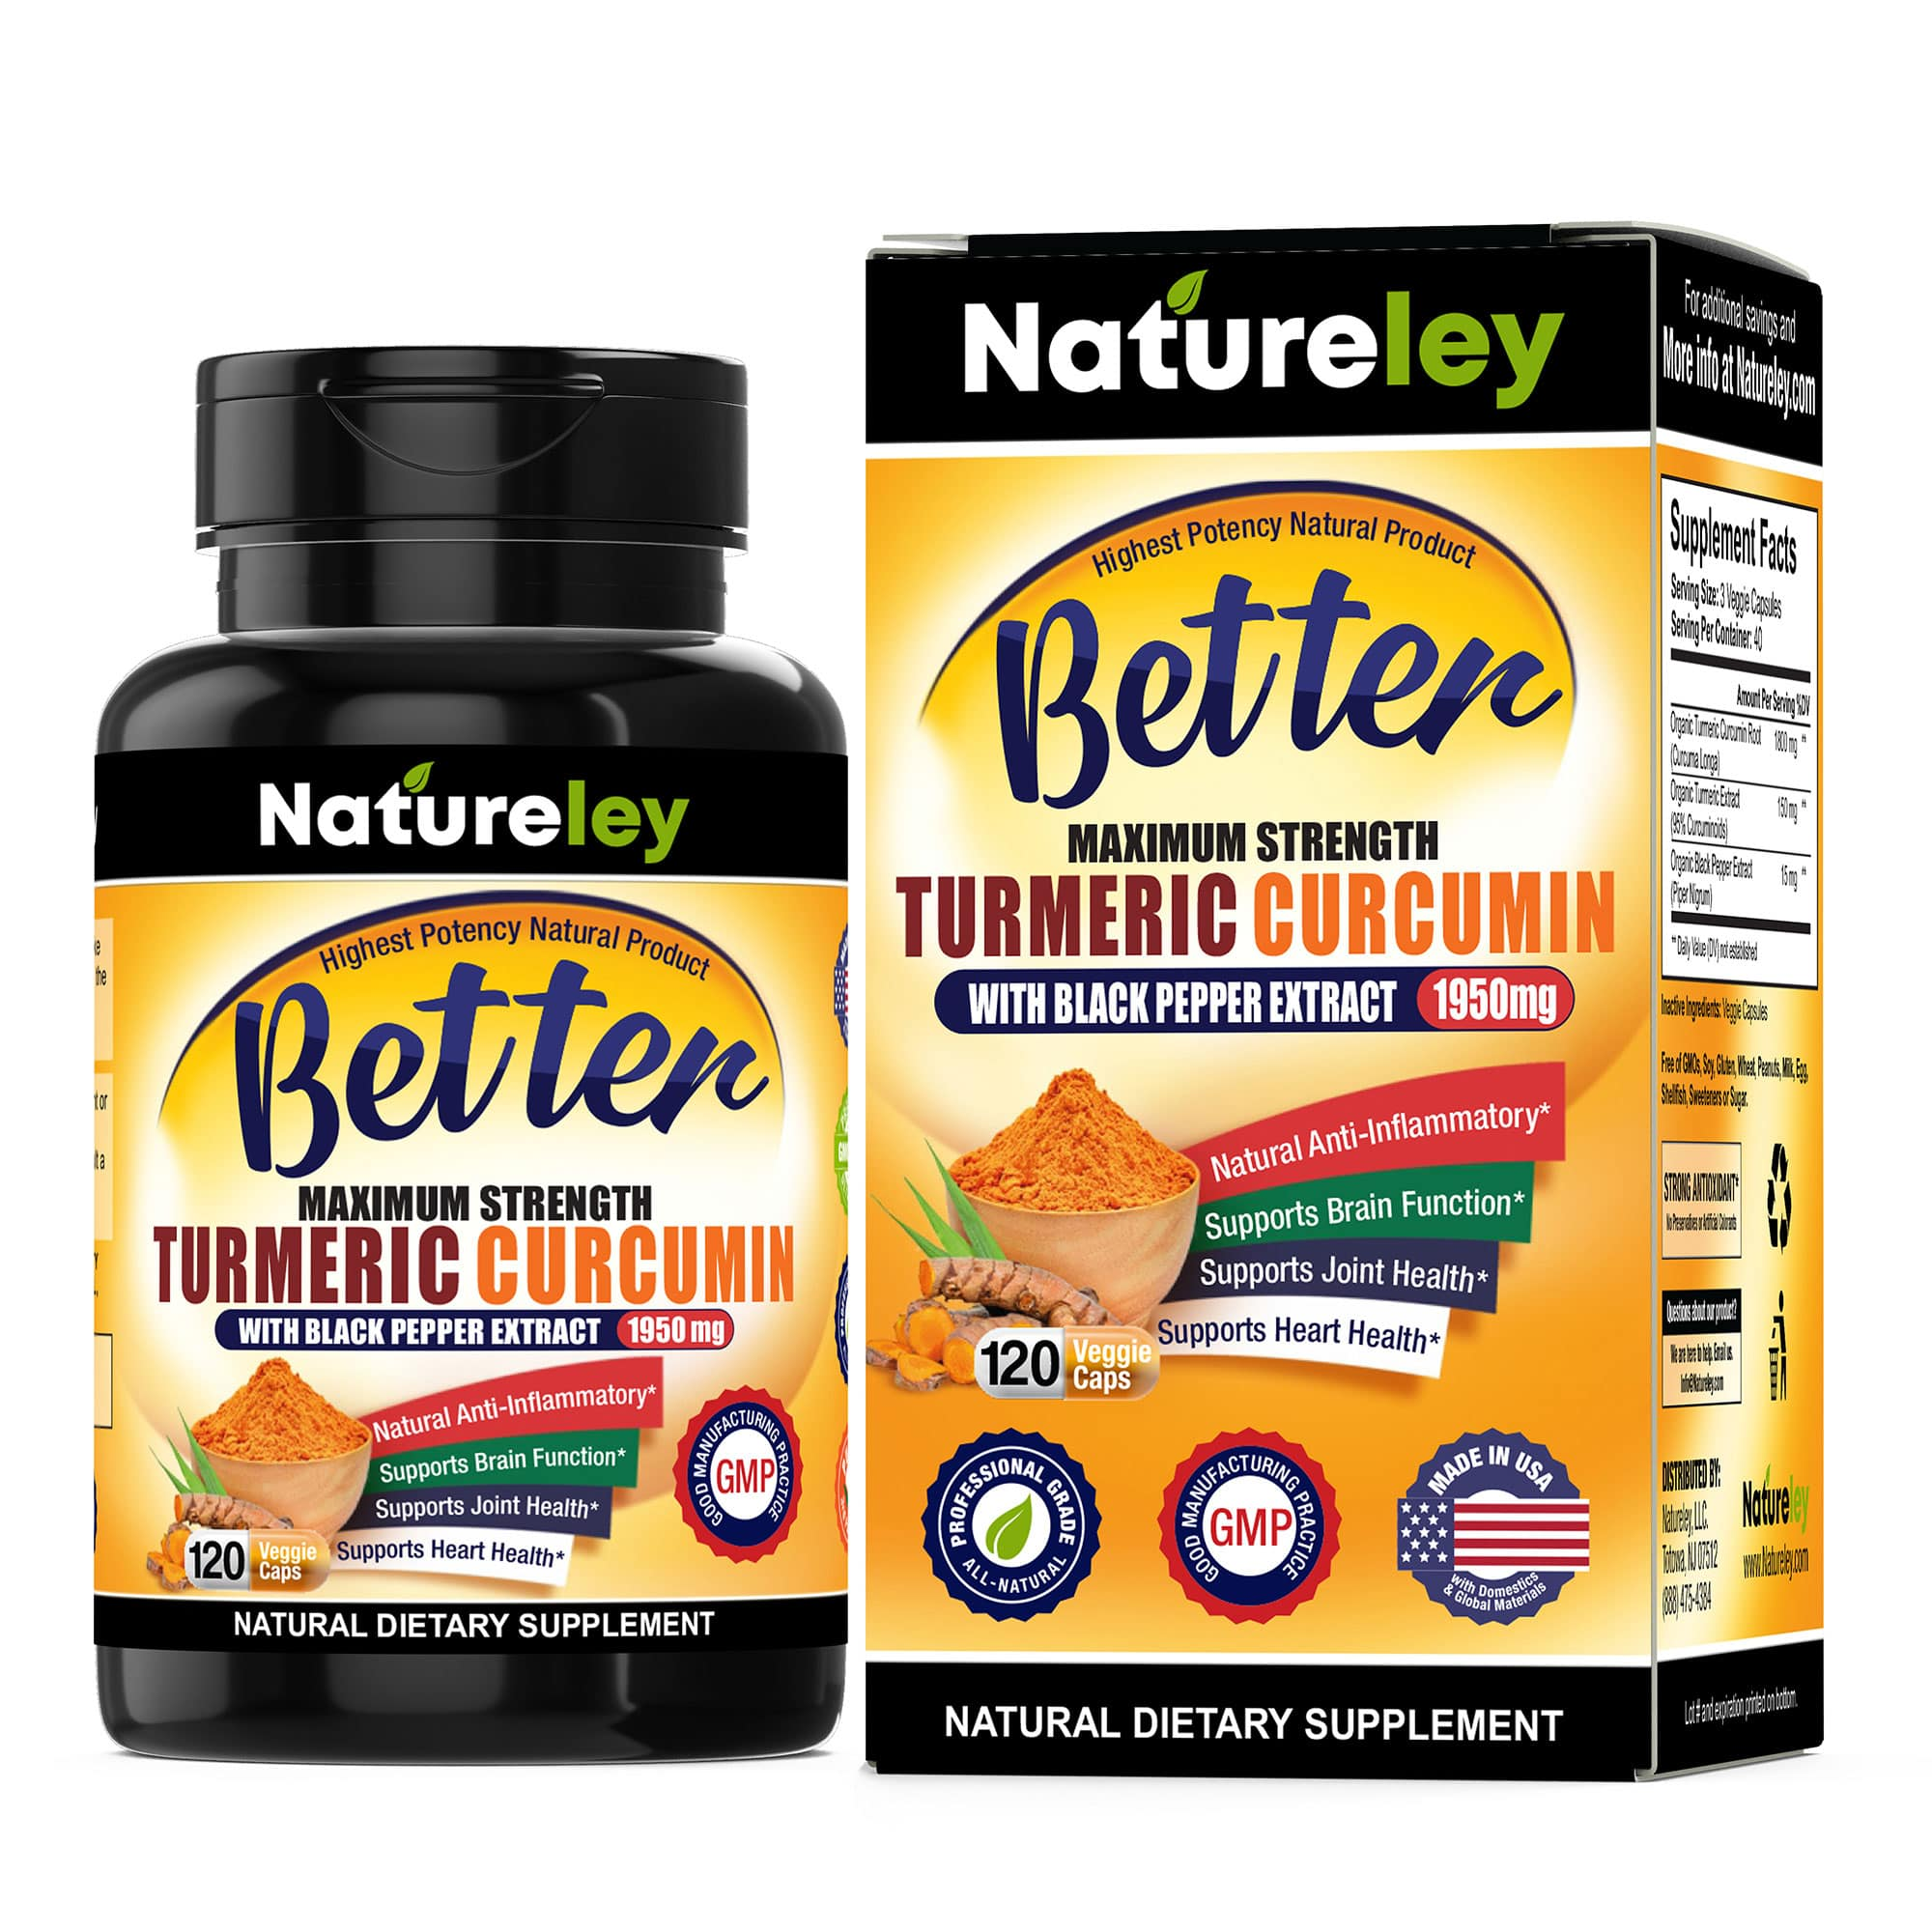 Organic Turmeric Curcumin with Black Pepper Extract - 1950 mg 120 Caps